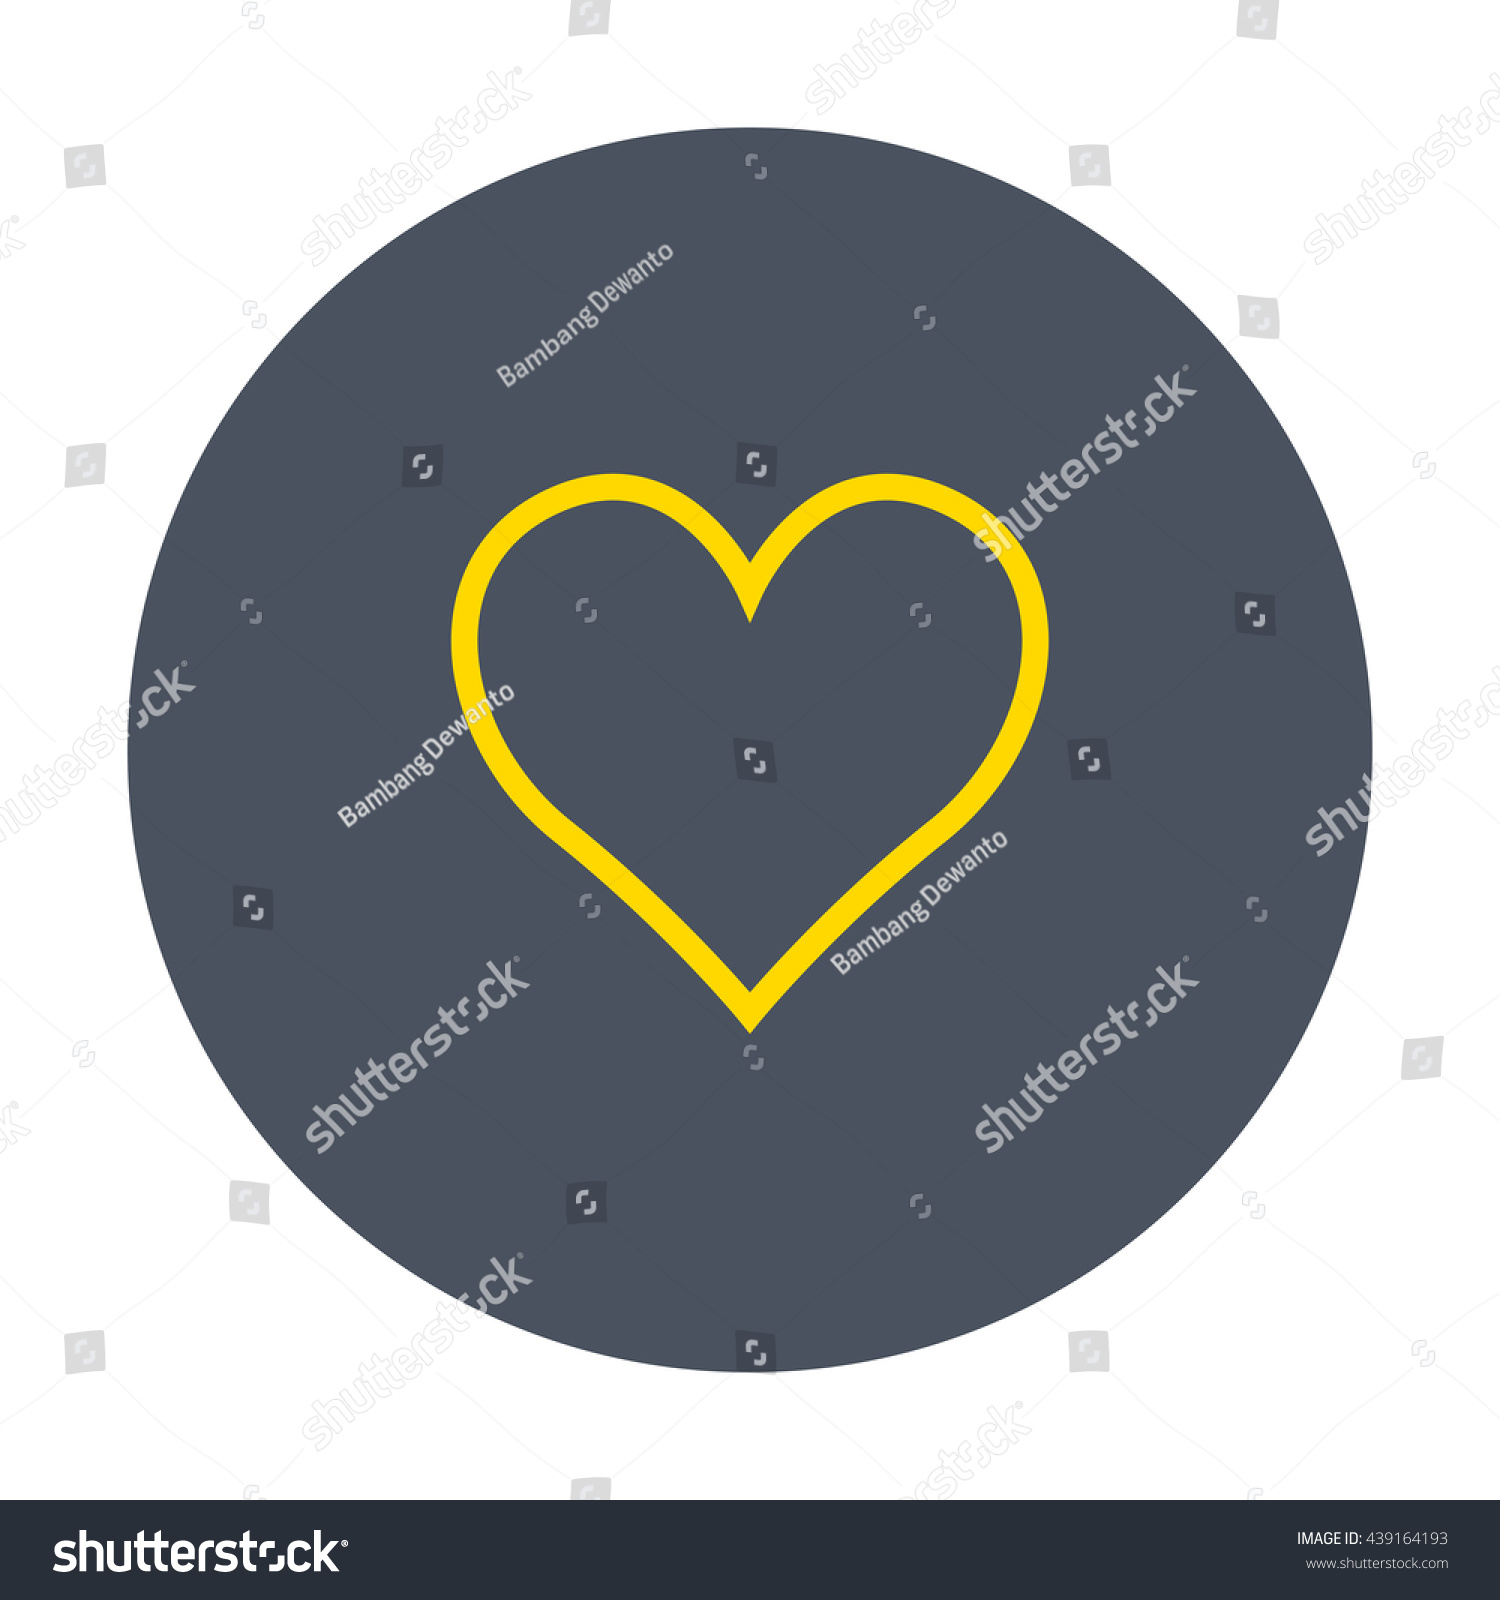 Gold line social love icon dark stock vector 439164193 shutterstock gold line social love icon in dark circle buycottarizona